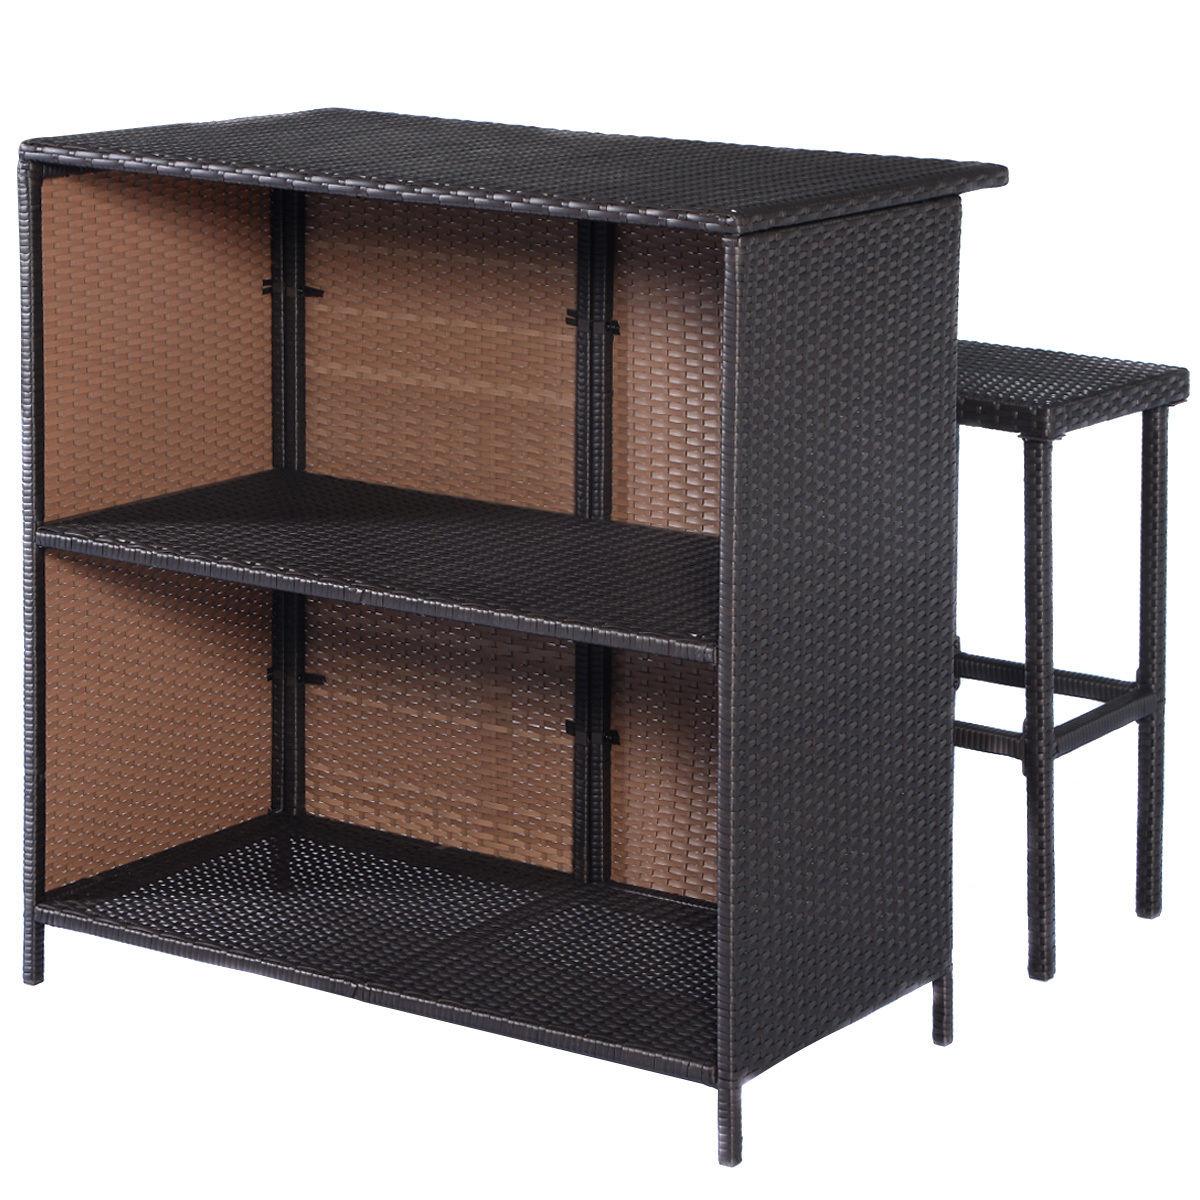 Costway 3PCS Rattan Wicker Bar Set Patio Outdoor Table & 2 Stools Furniture Brown 4